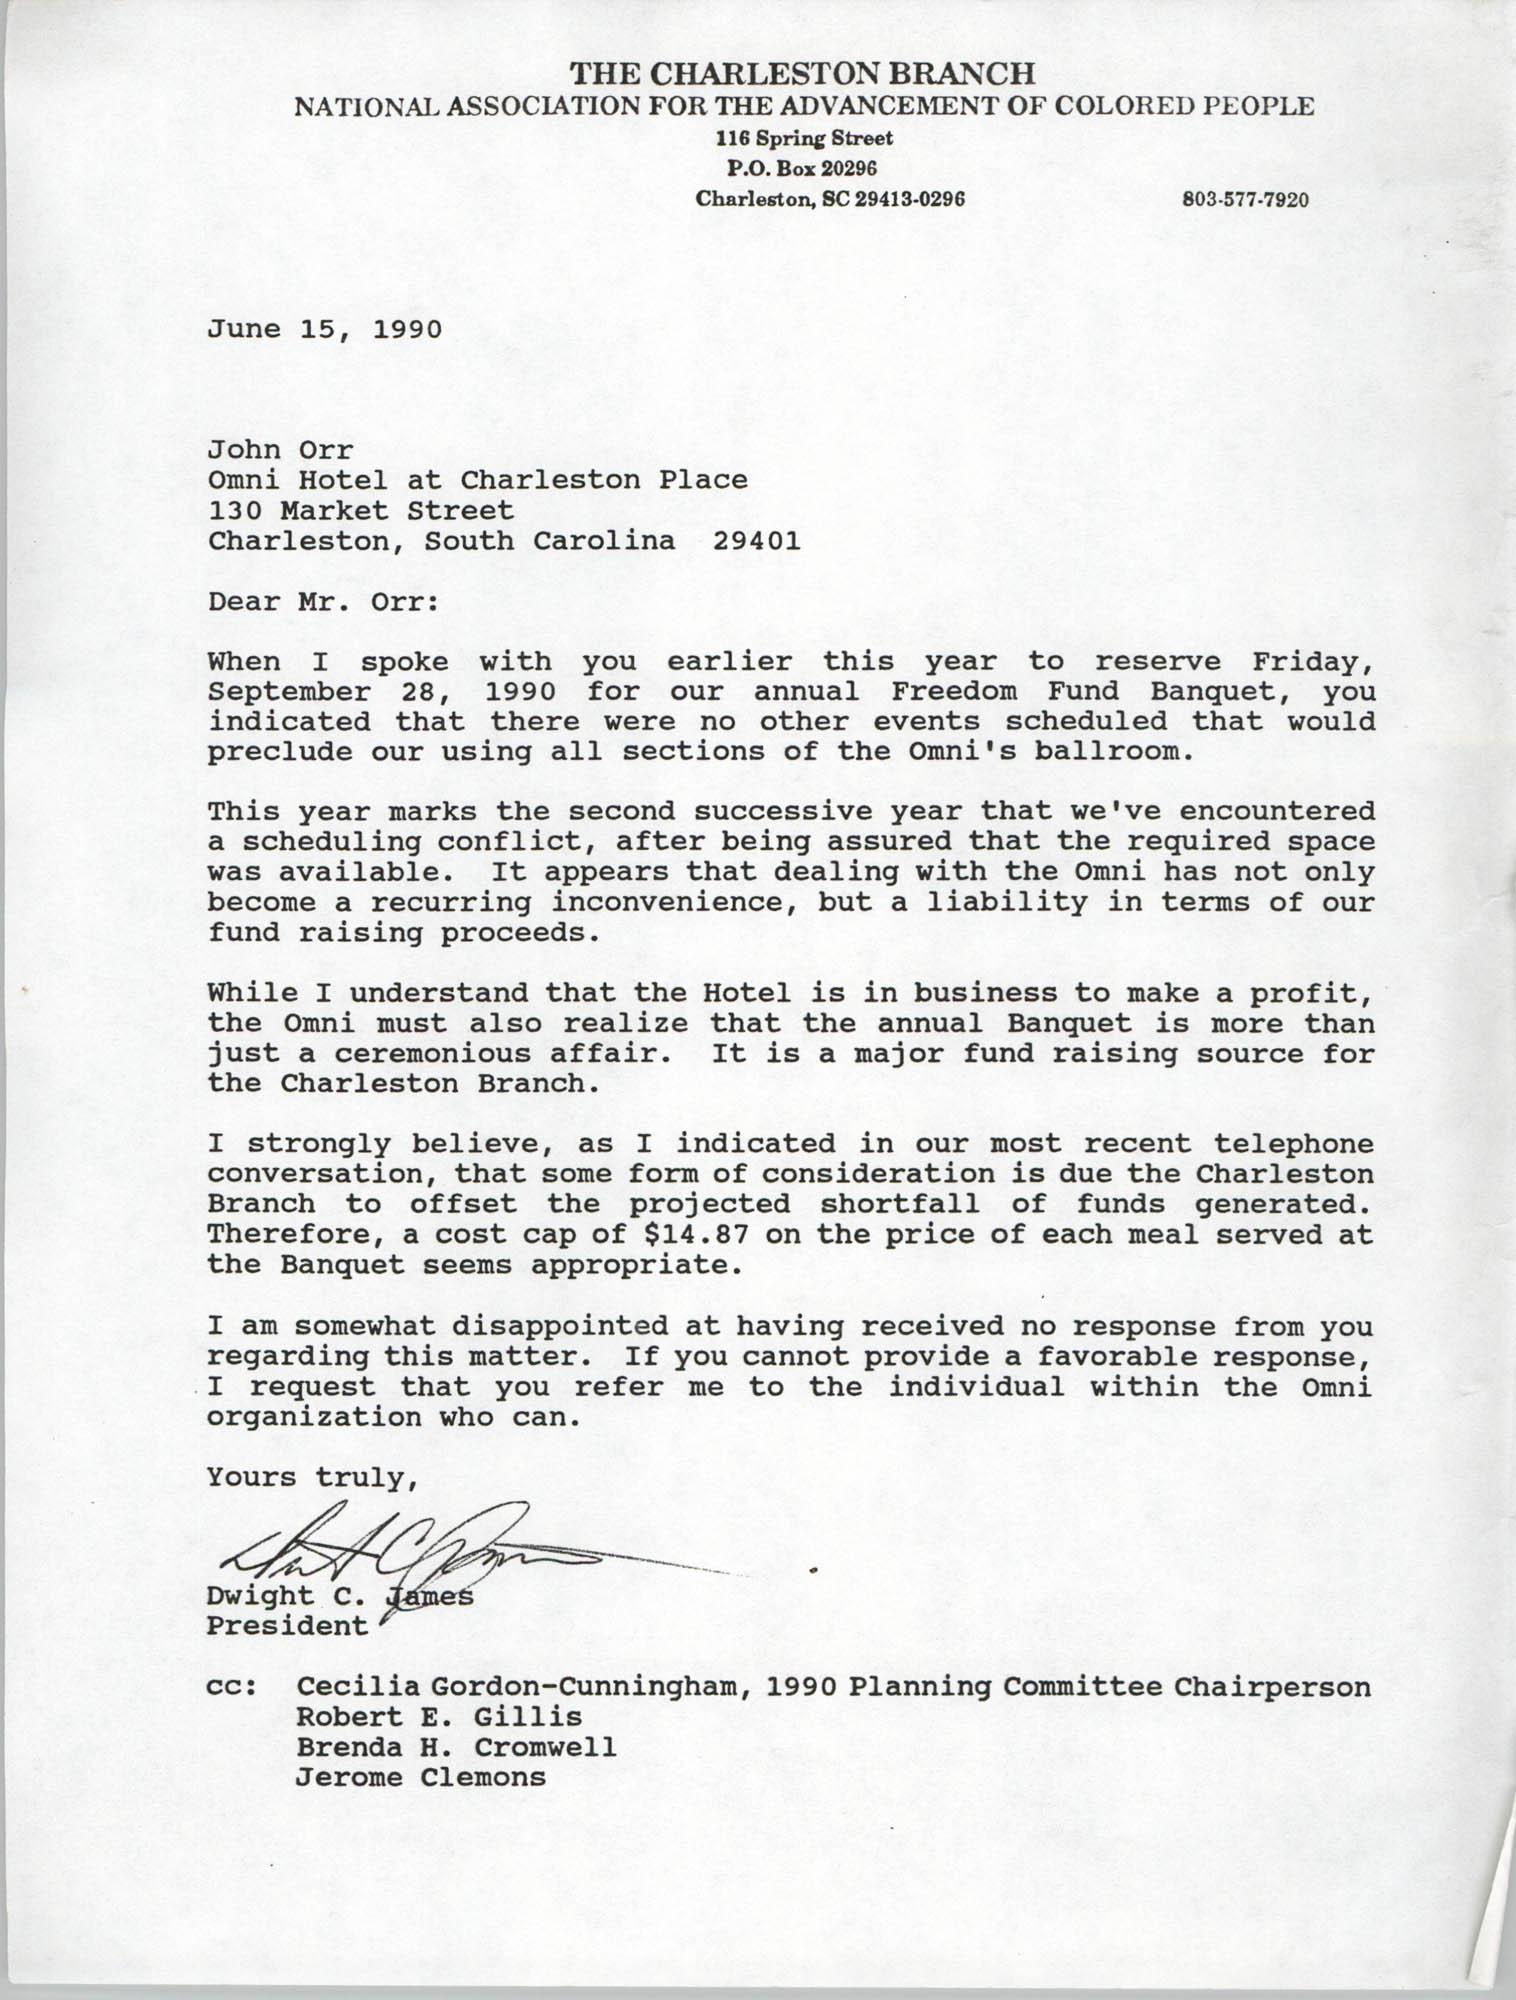 Letter from Dwight C. James to John Orr, June 15, 1990